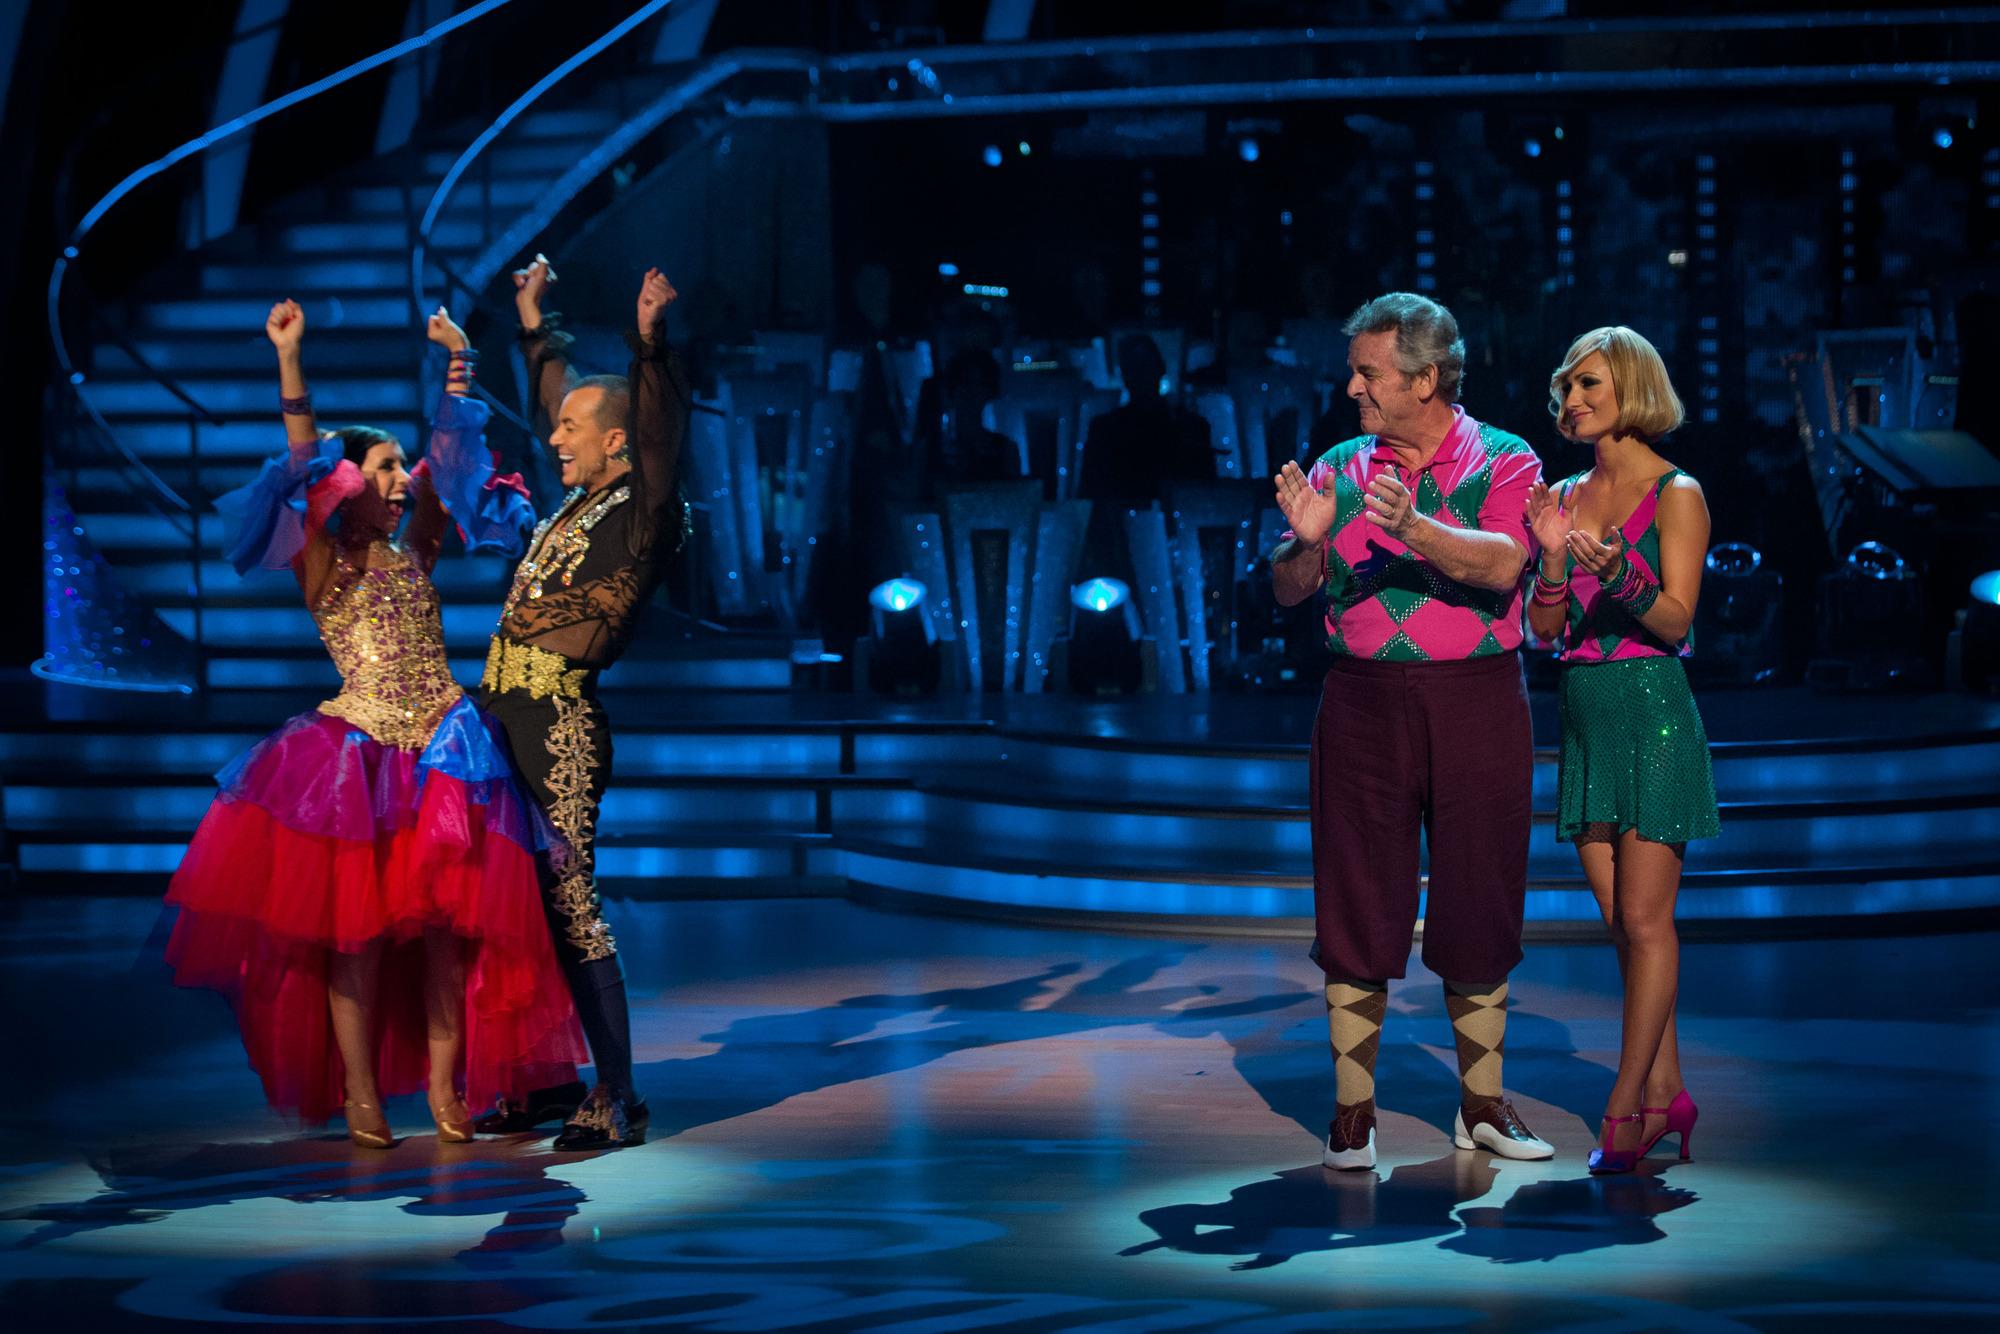 Janette Manrara, Julien Macdonald, Tony Jacklin, Aliona Vilani - (C) BBC - Photographer: Guy Levy